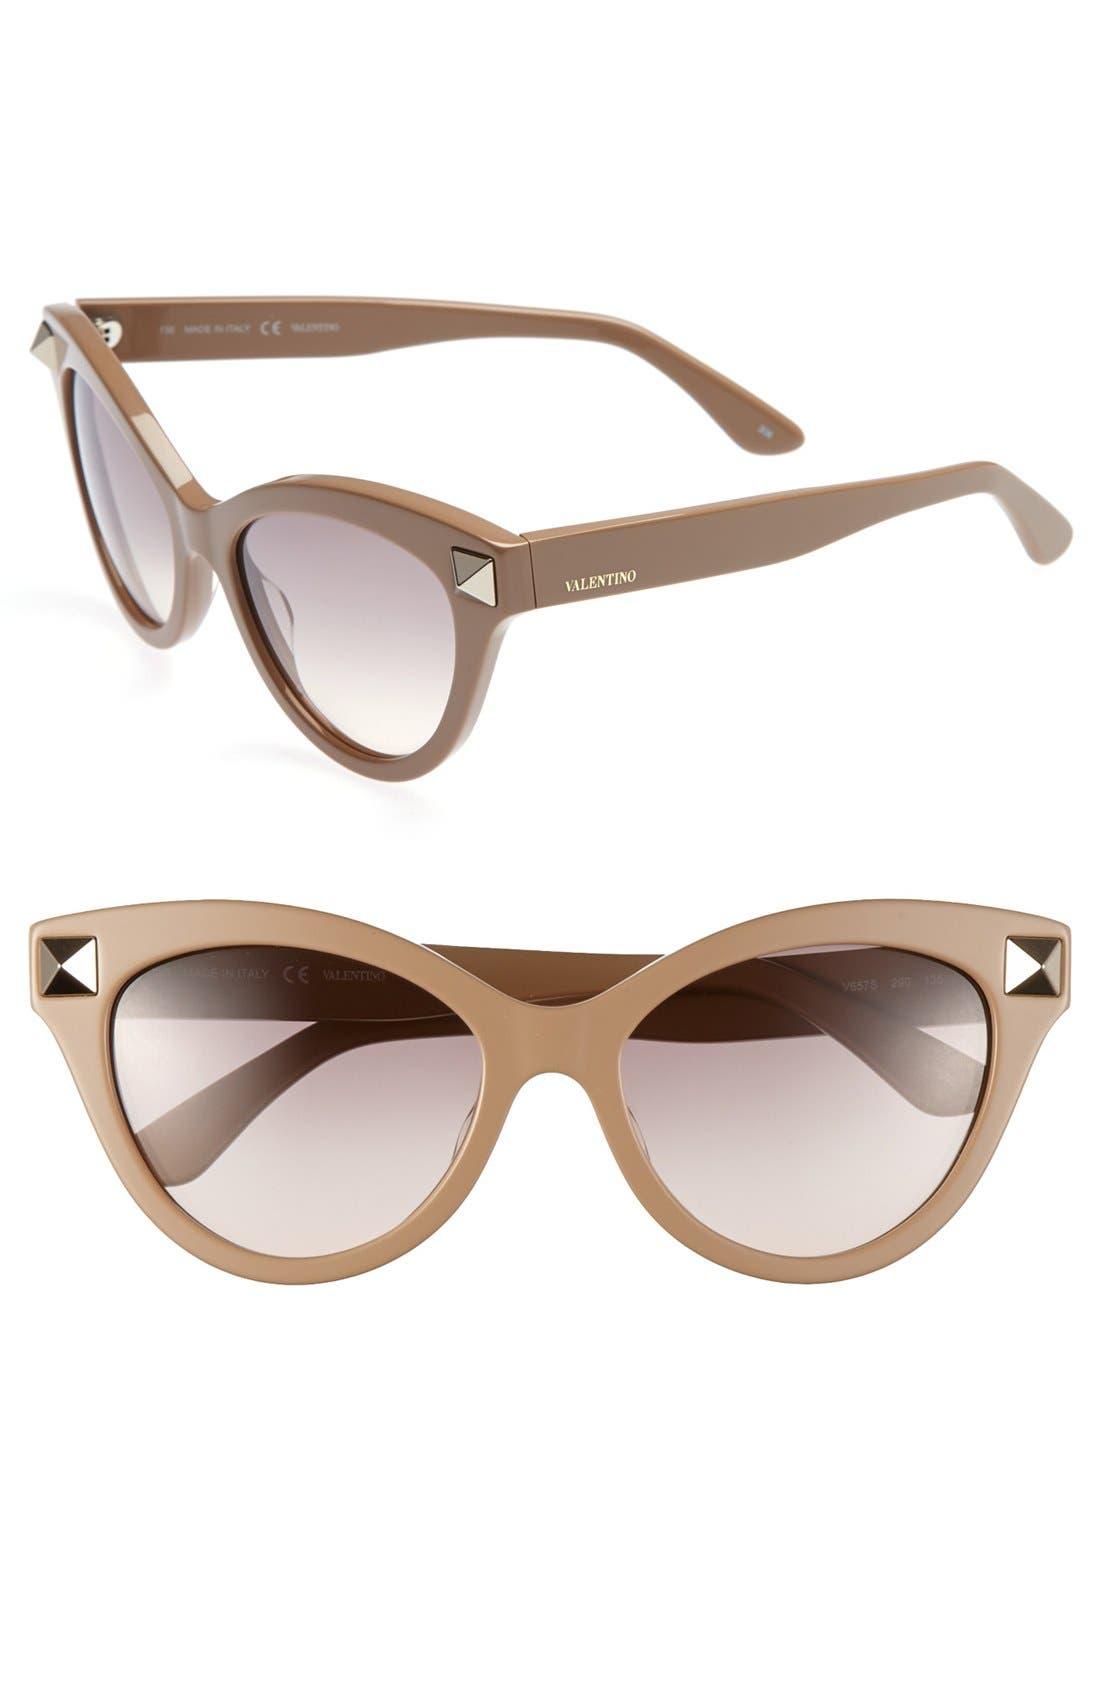 'Rockstud' 53mm Retro Sunglasses,                         Main,                         color, Nude